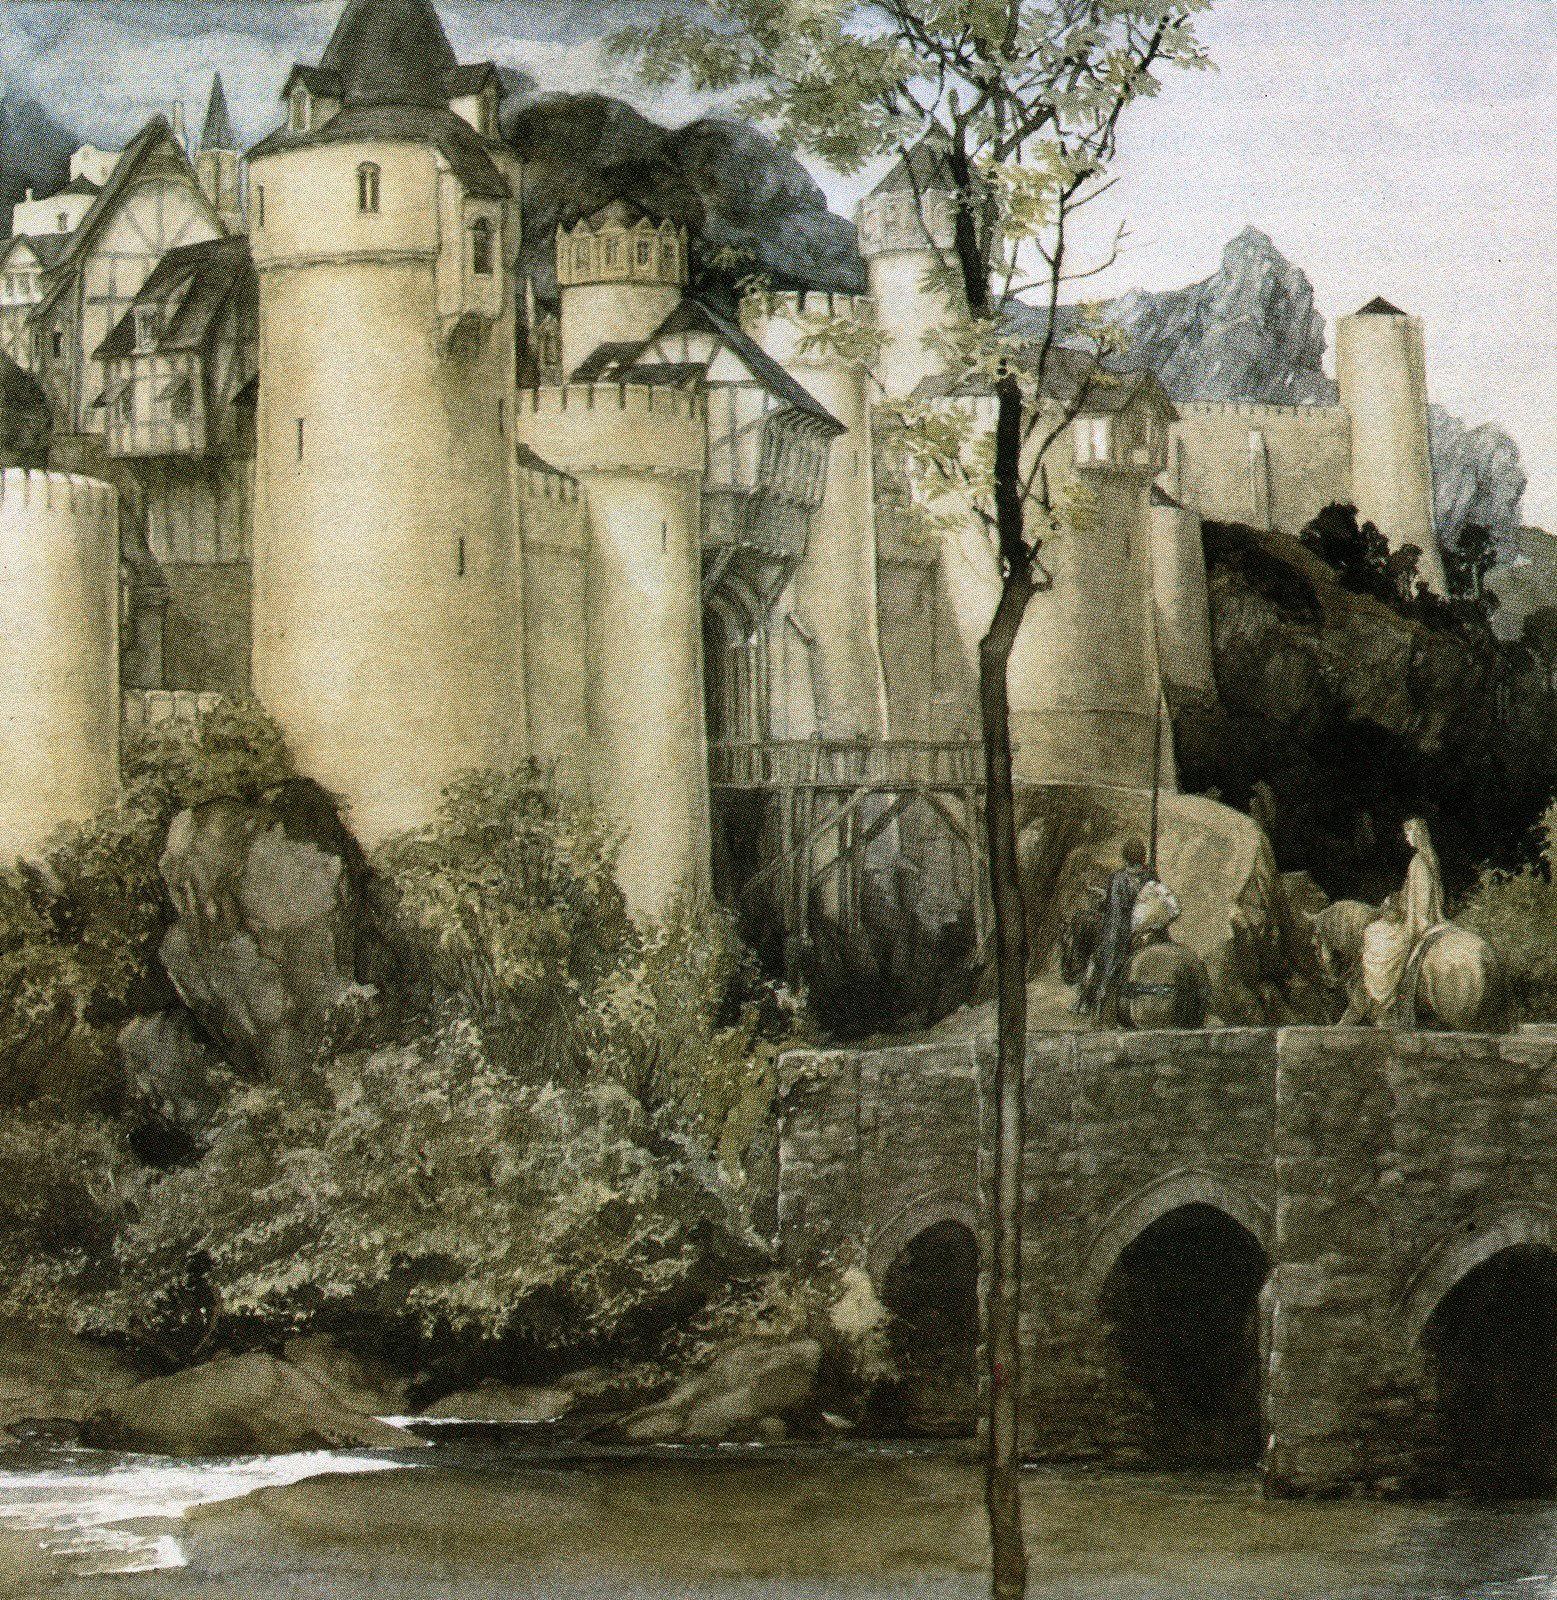 Myth & Moor: The Mythic Art of Alan Lee